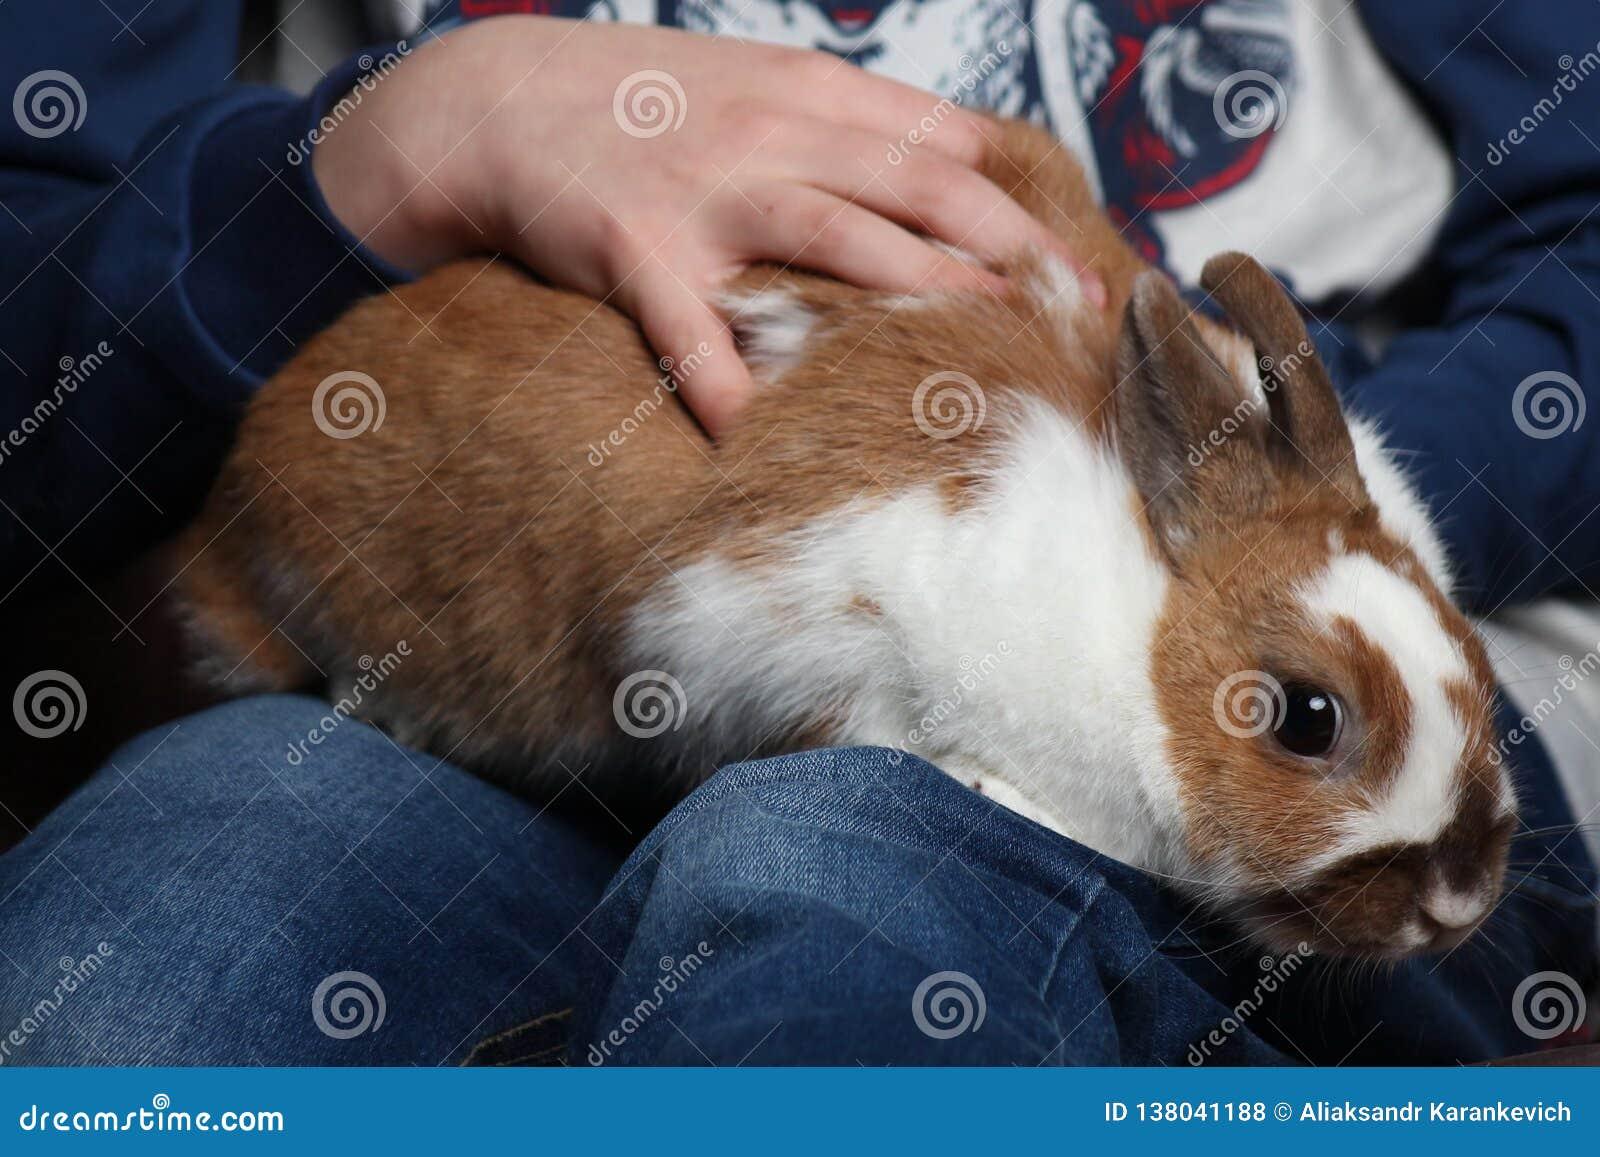 Кролик сидя на руках ребенка забота для животных, младенец petting зайчик